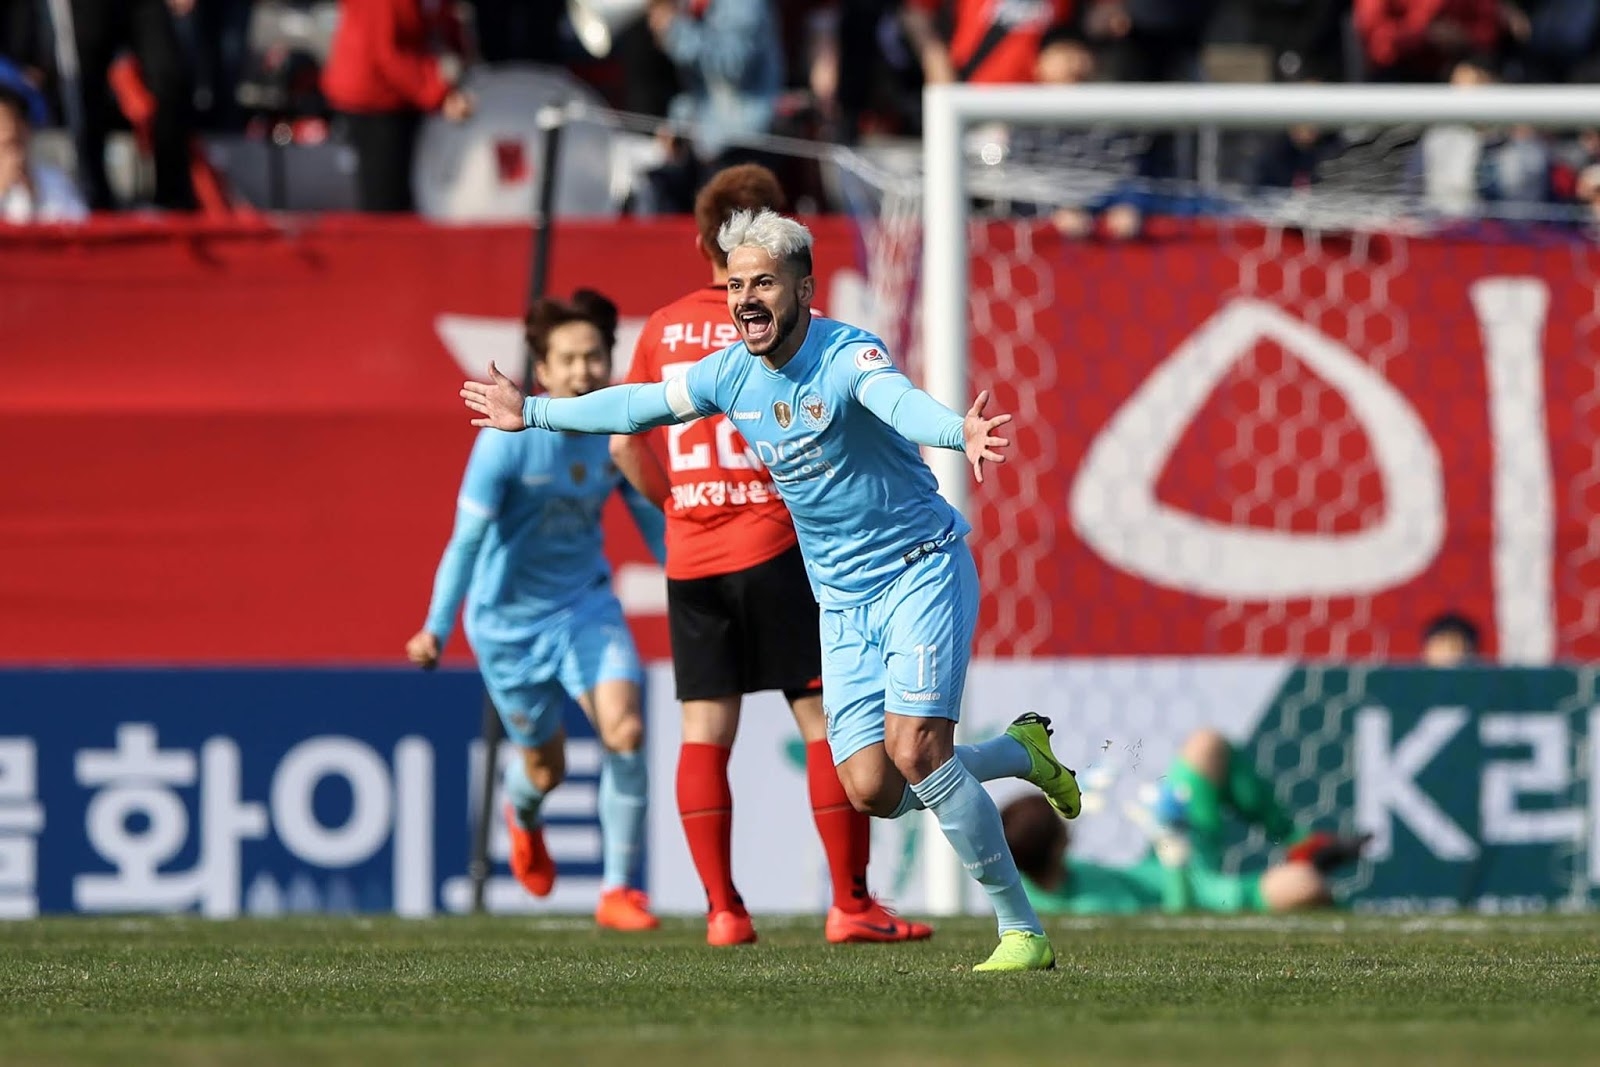 Preview: Daegu FC vs Gyeongnam FC K League 1 Round 19